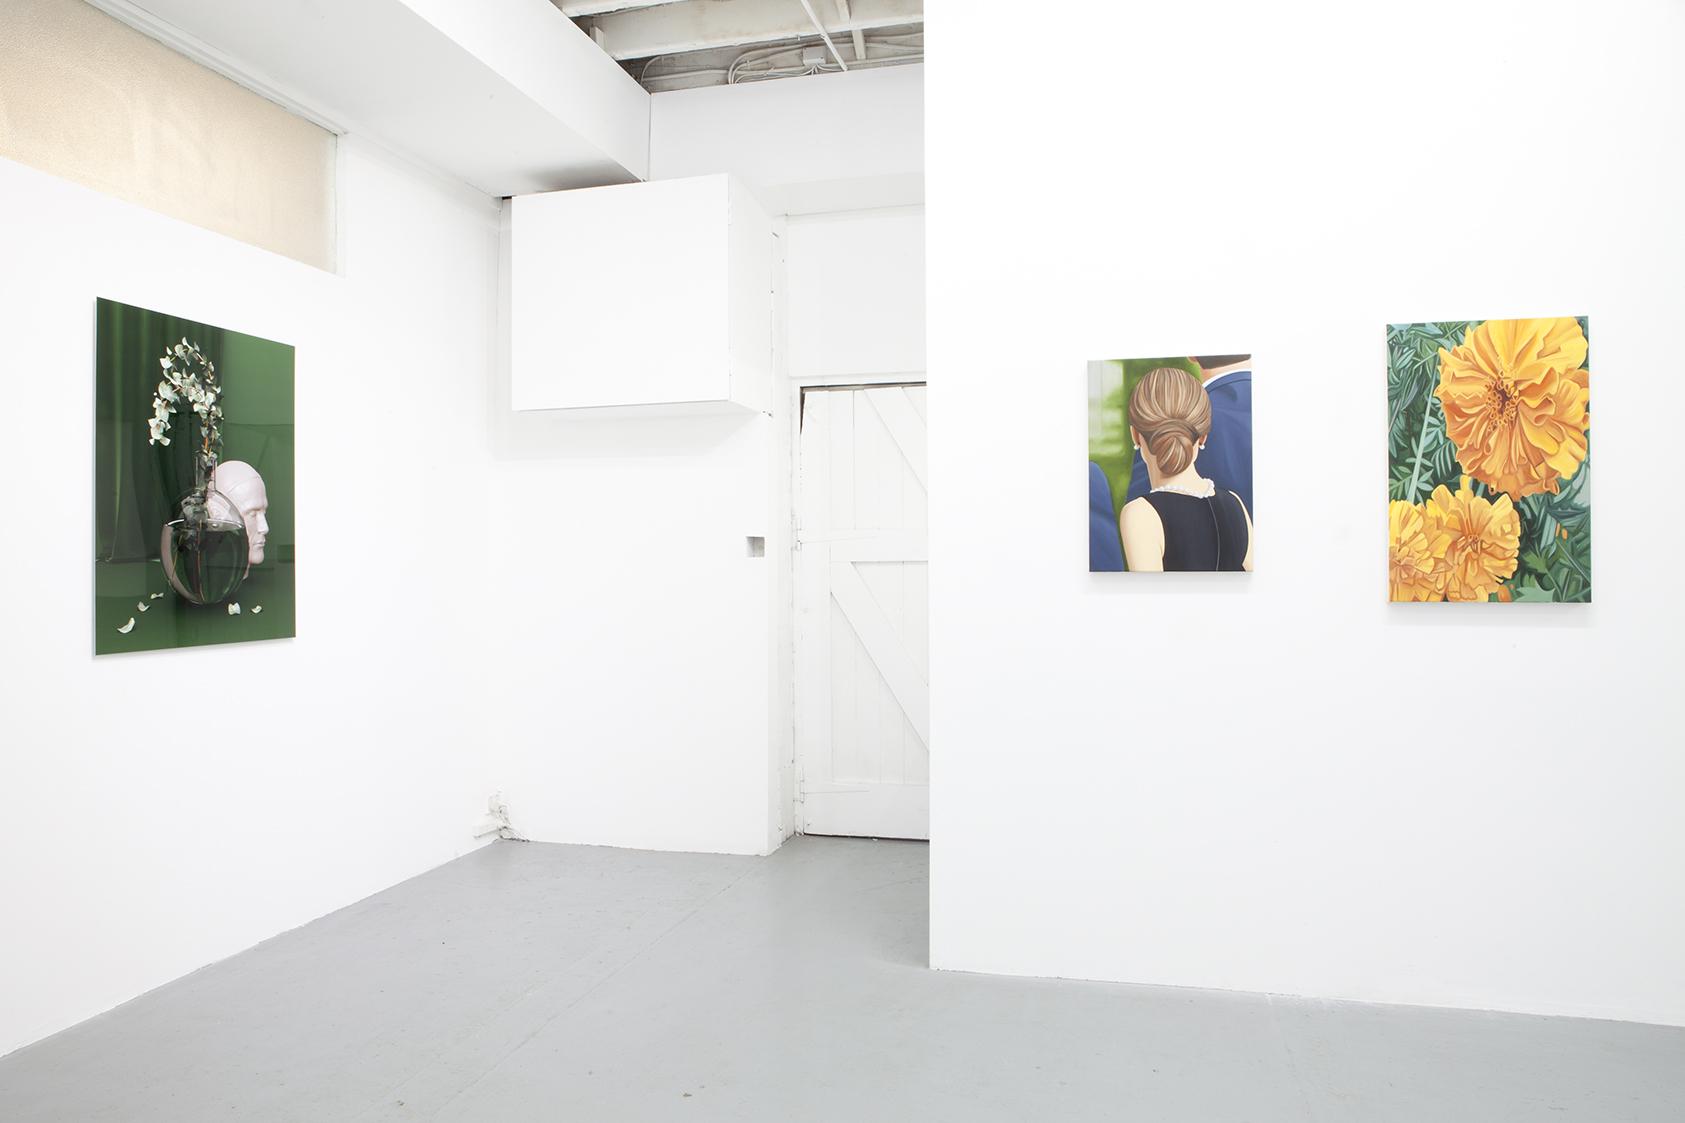 Annika Koops, Matthew Dettmer